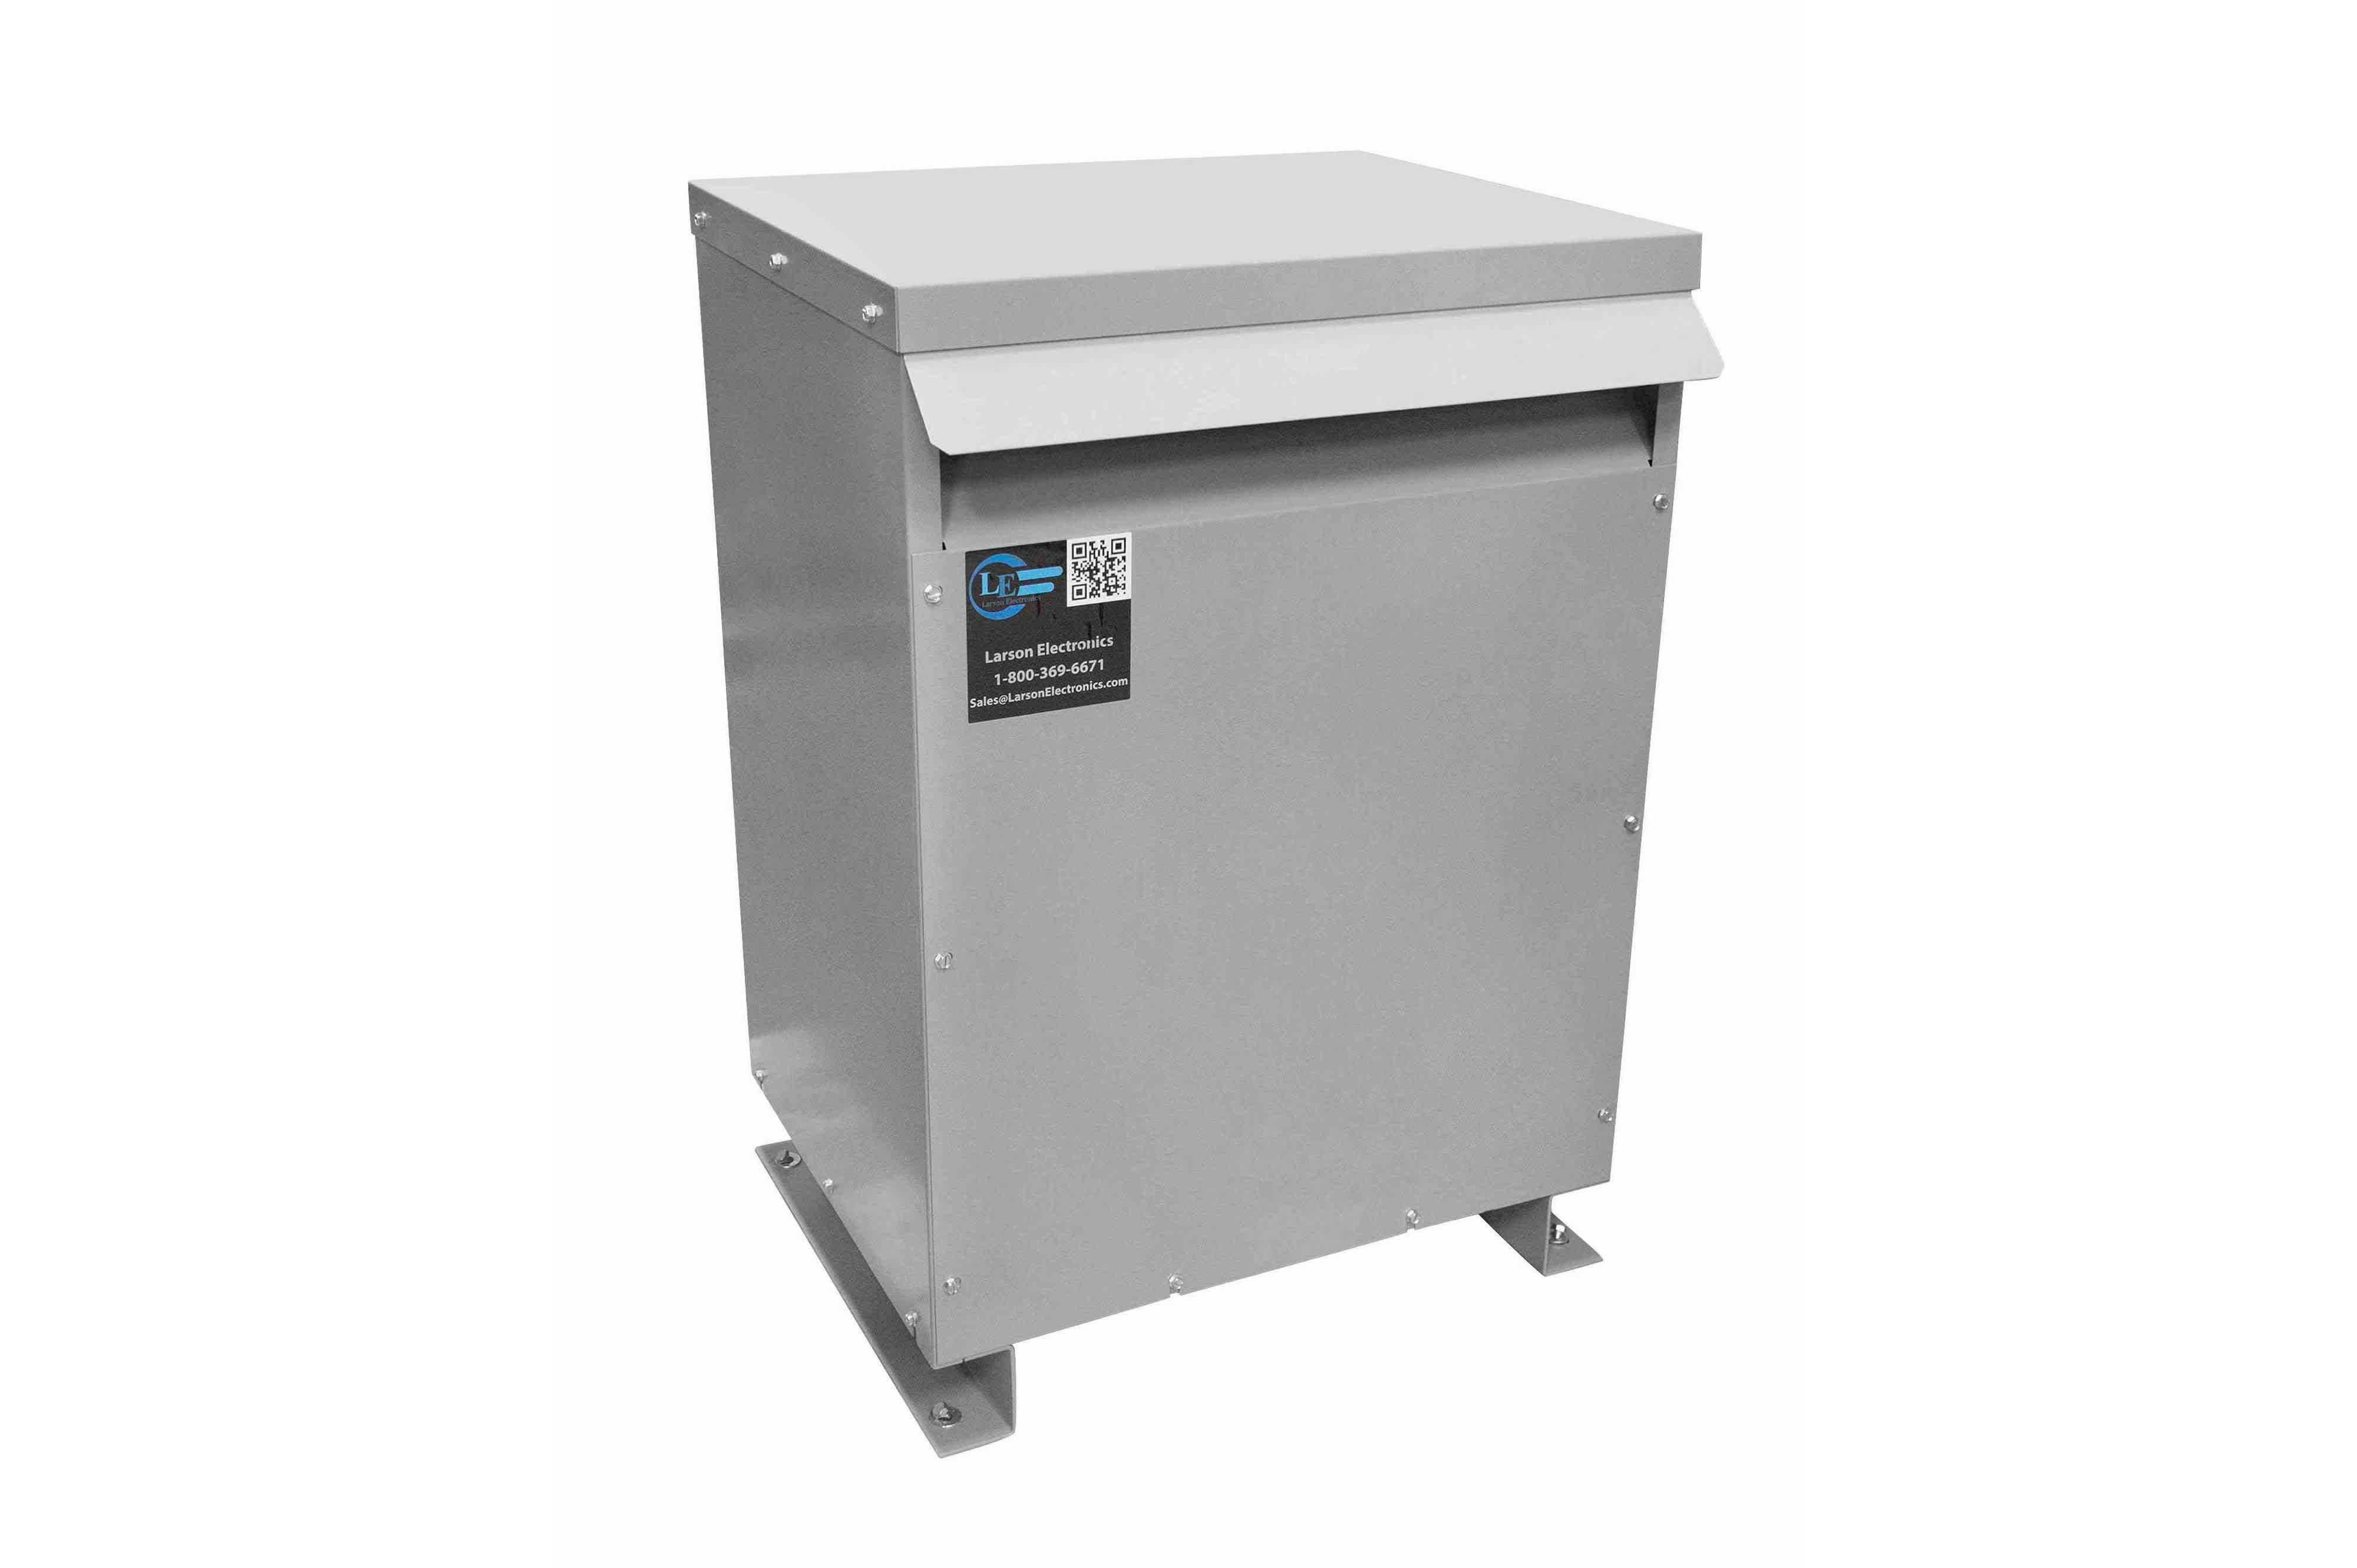 36 kVA 3PH Isolation Transformer, 480V Wye Primary, 380Y/220 Wye-N Secondary, N3R, Ventilated, 60 Hz